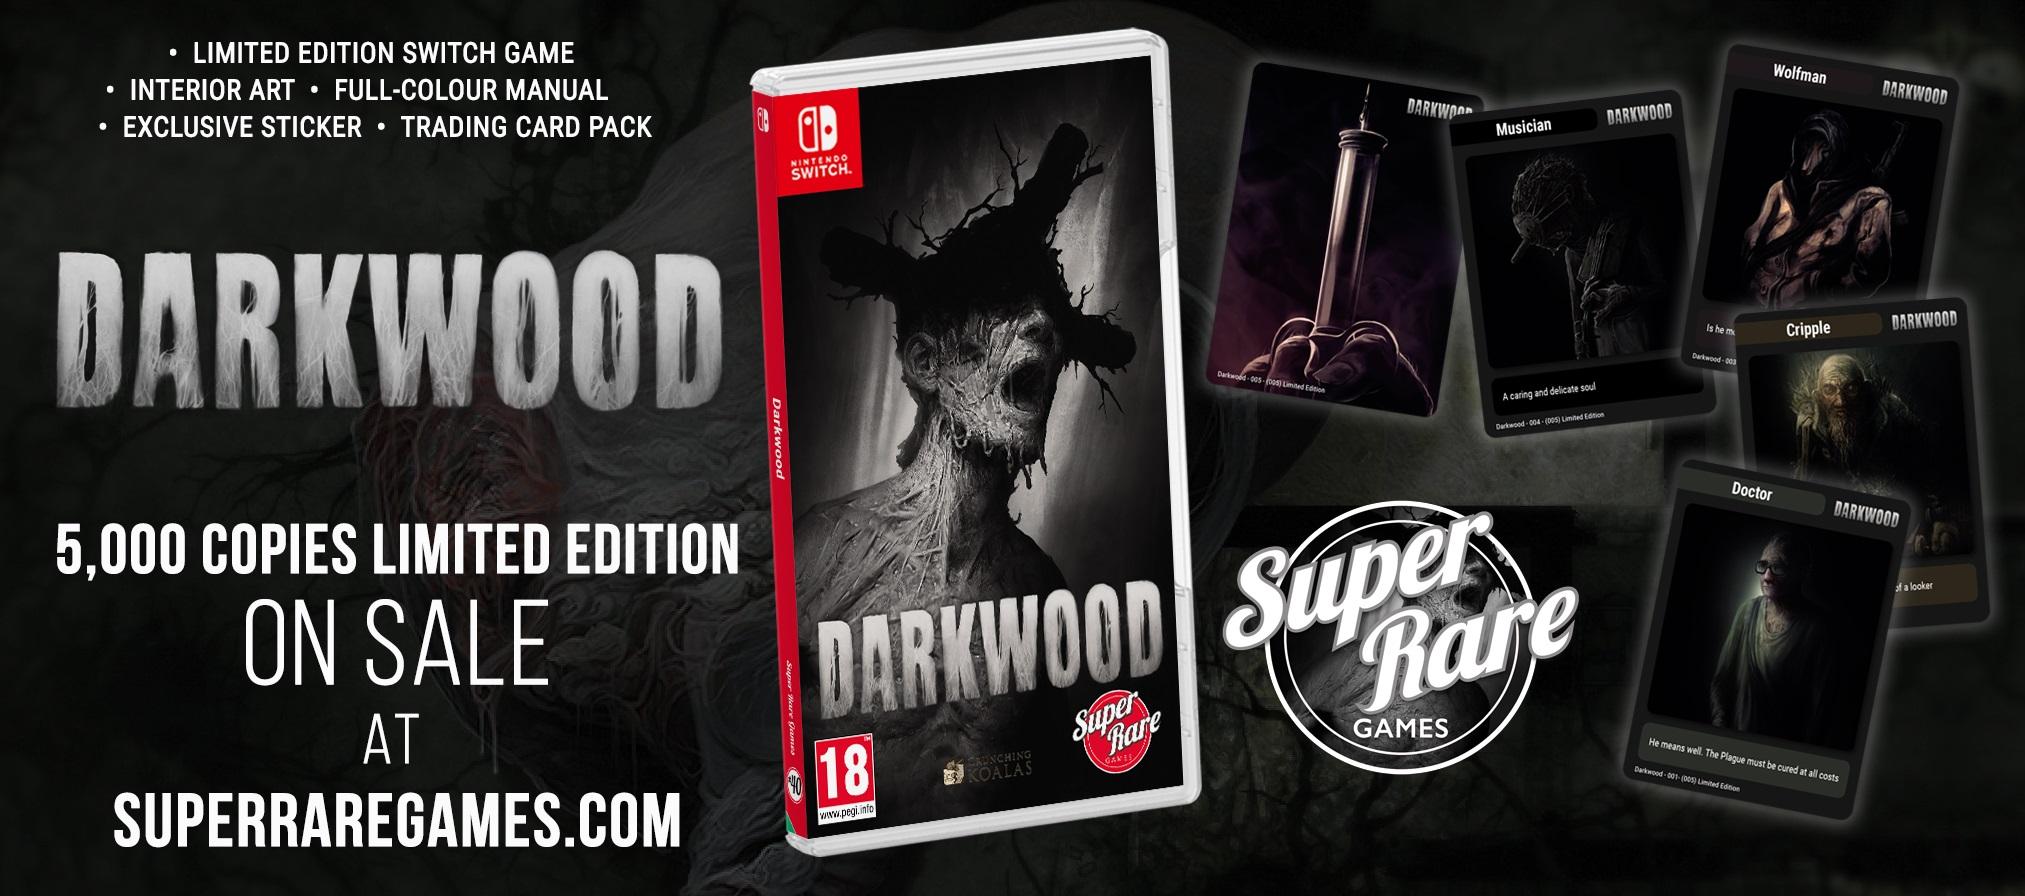 Darkwood contest Super Rare Games win Switch Halloween horror